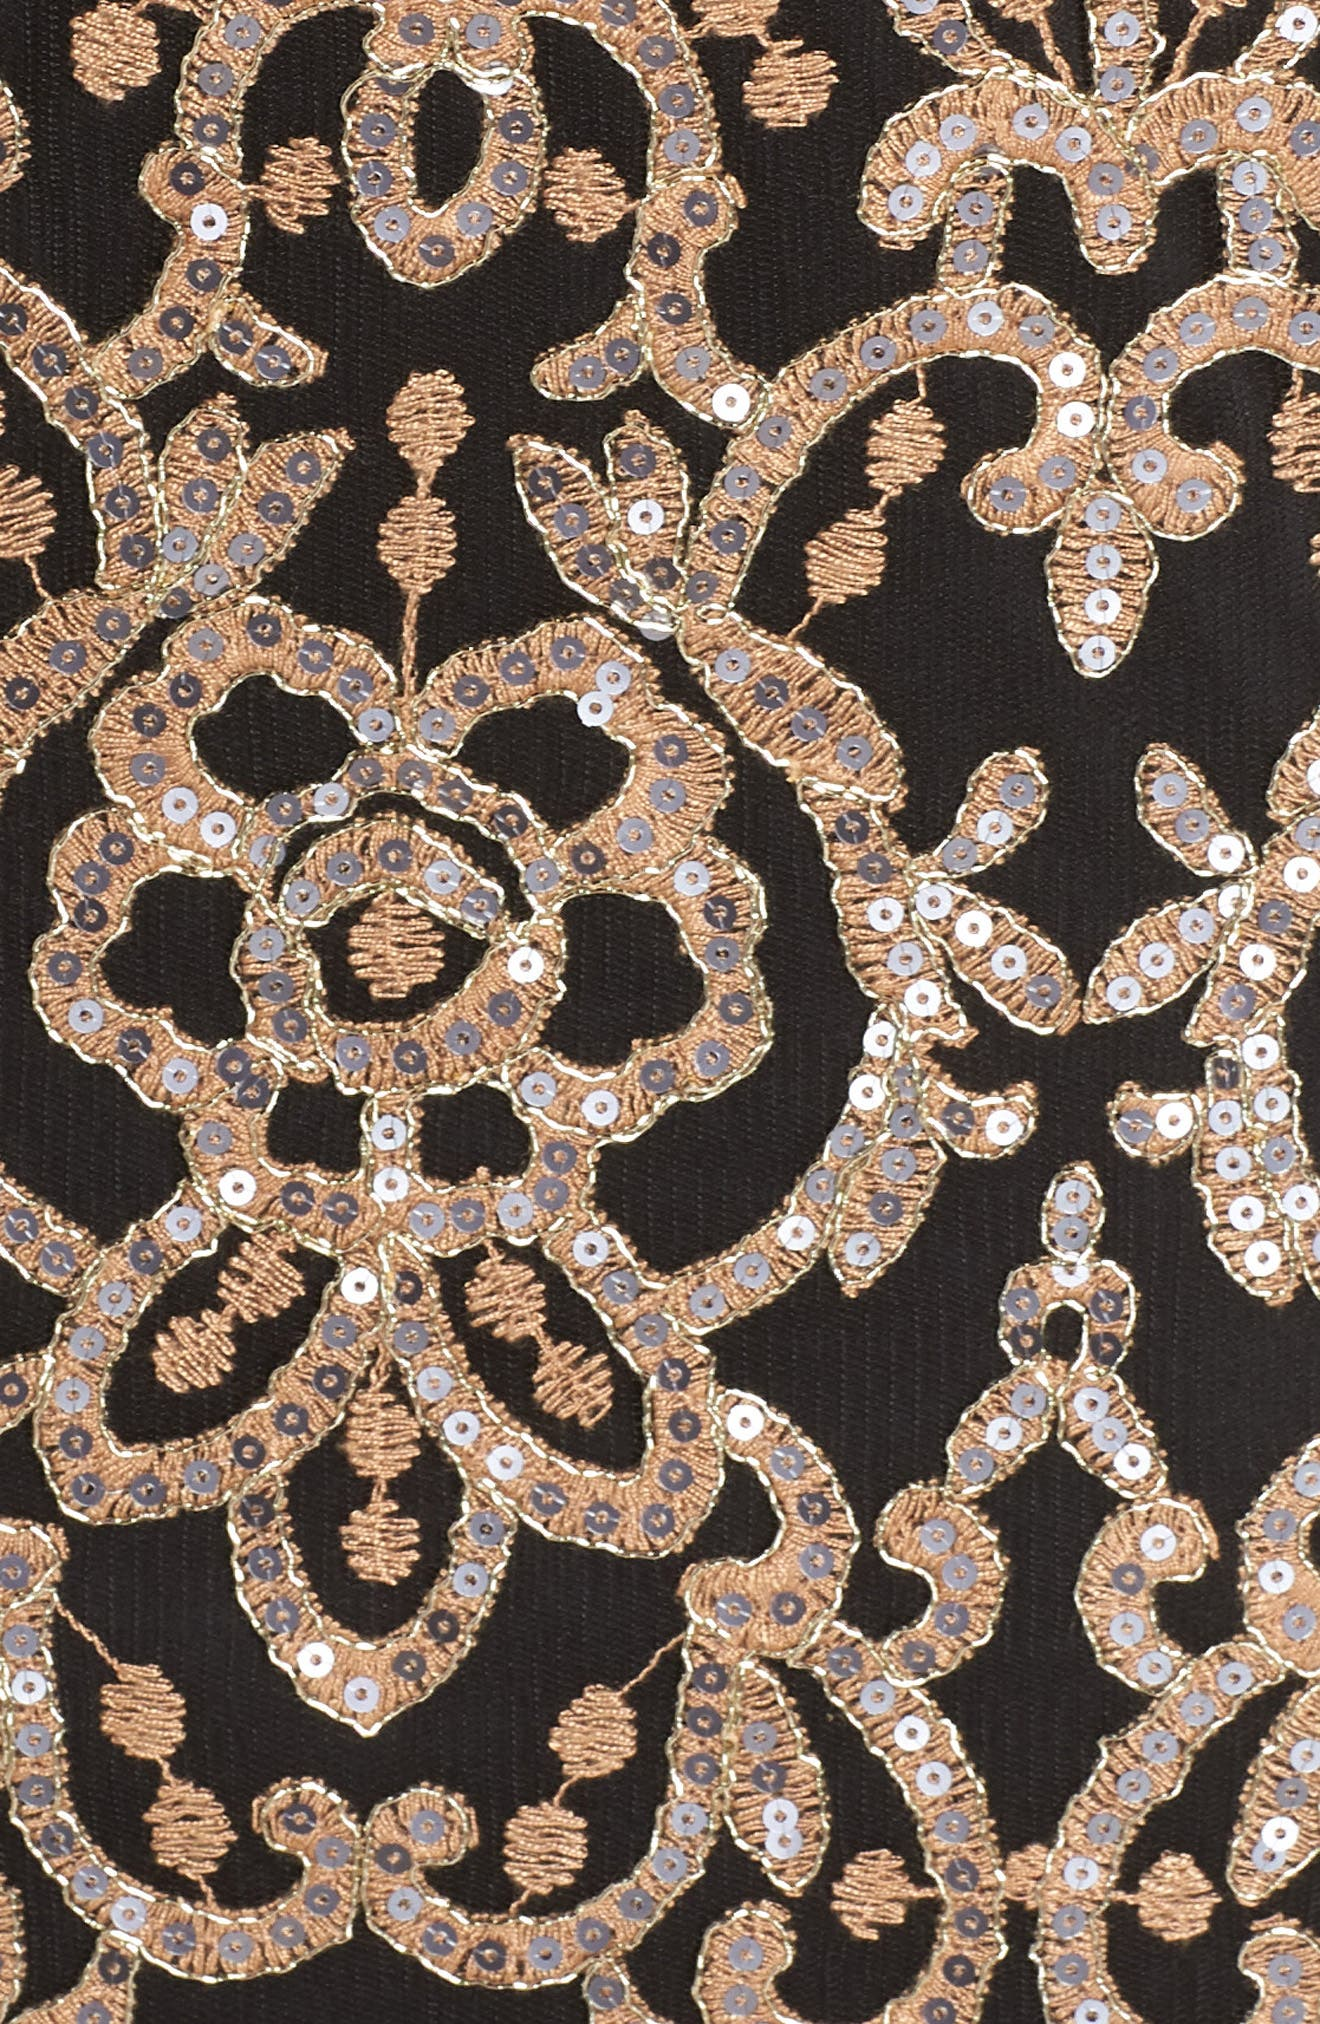 Sequin Embellished Dress,                             Alternate thumbnail 6, color,                             COPPER SHADOW/ BLACK